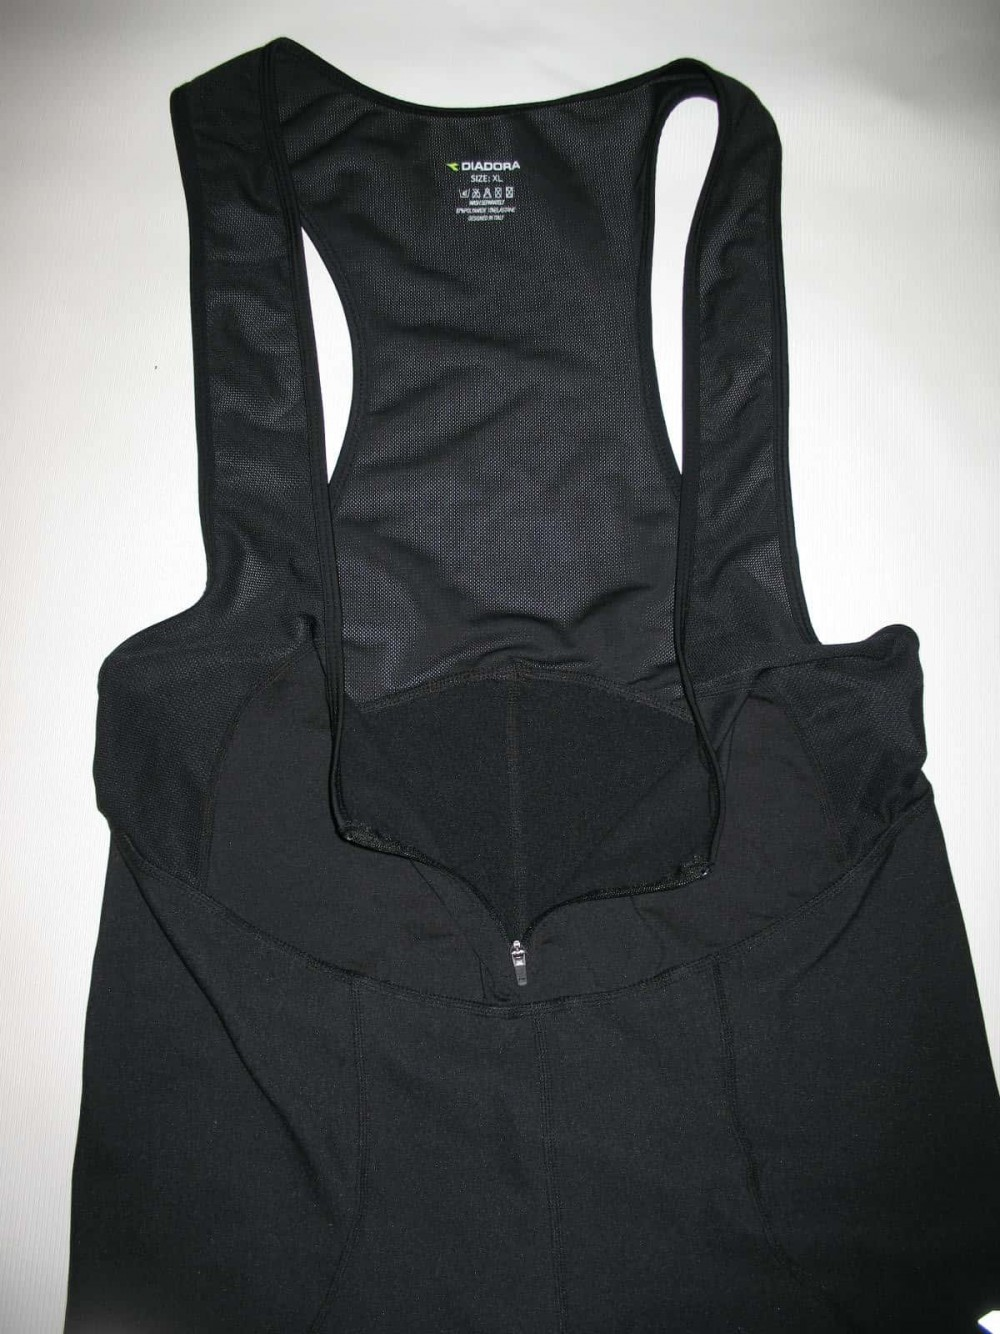 Велобрюки DIADORA cycling windstopper bib pants(размер XL/реально L) - 3